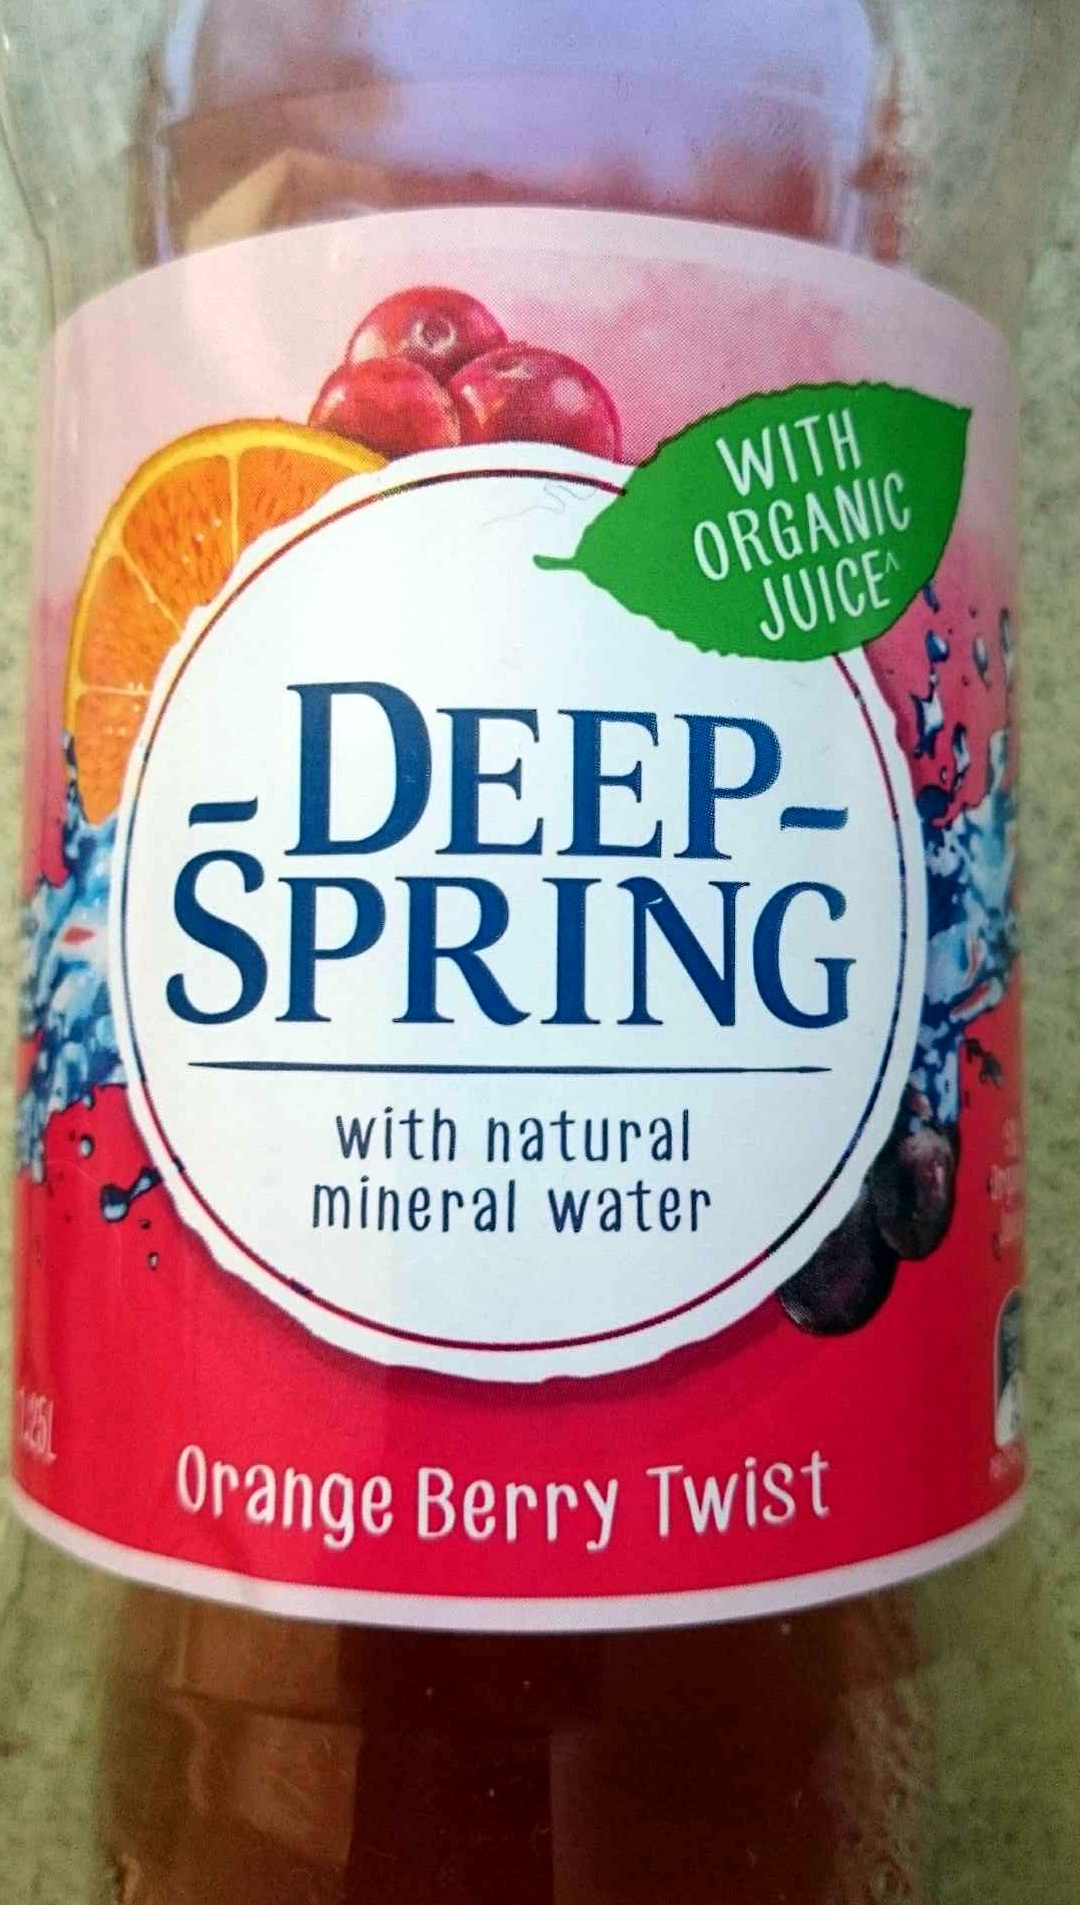 Deep Spring Orange Berry Twist - Product